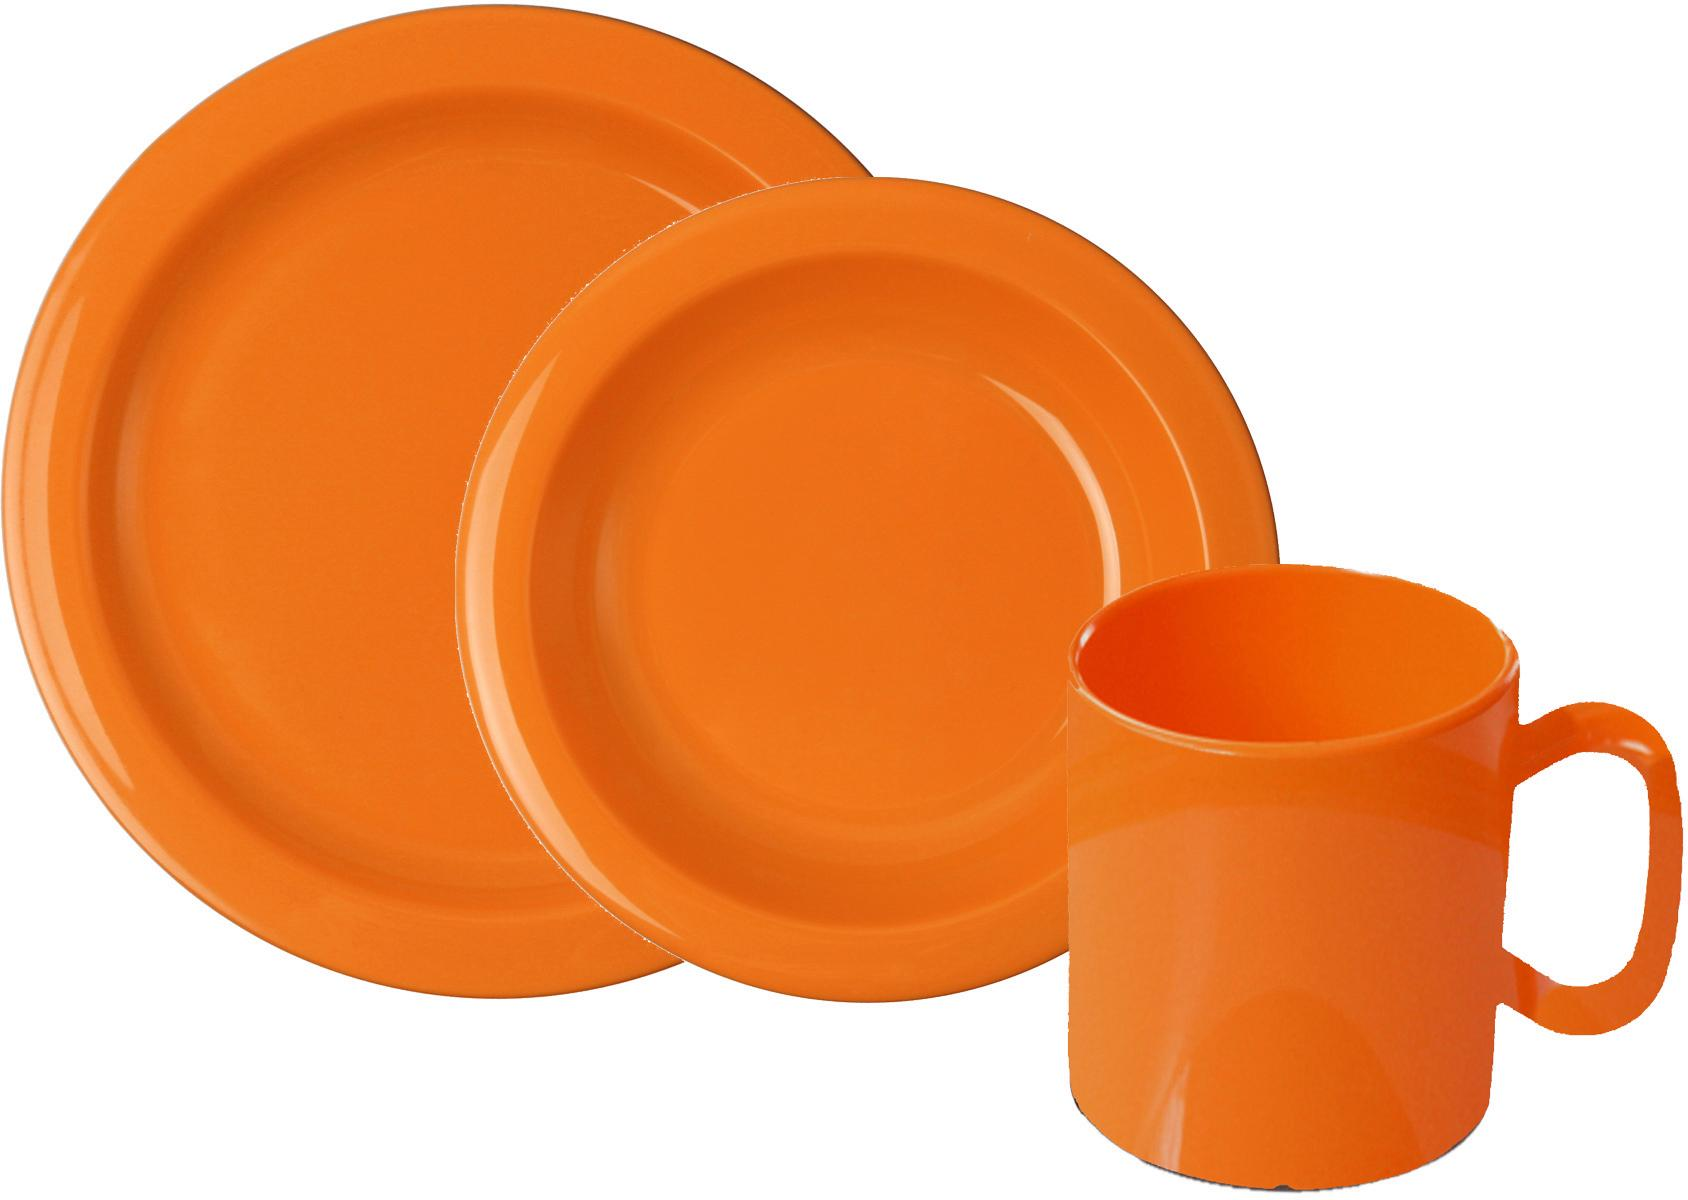 WACA Frühstücks-Set, (Set, 6 tlg.) orange Frühstücksset Eierbecher Geschirr, Porzellan Tischaccessoires Haushaltswaren Frühstücks-Set